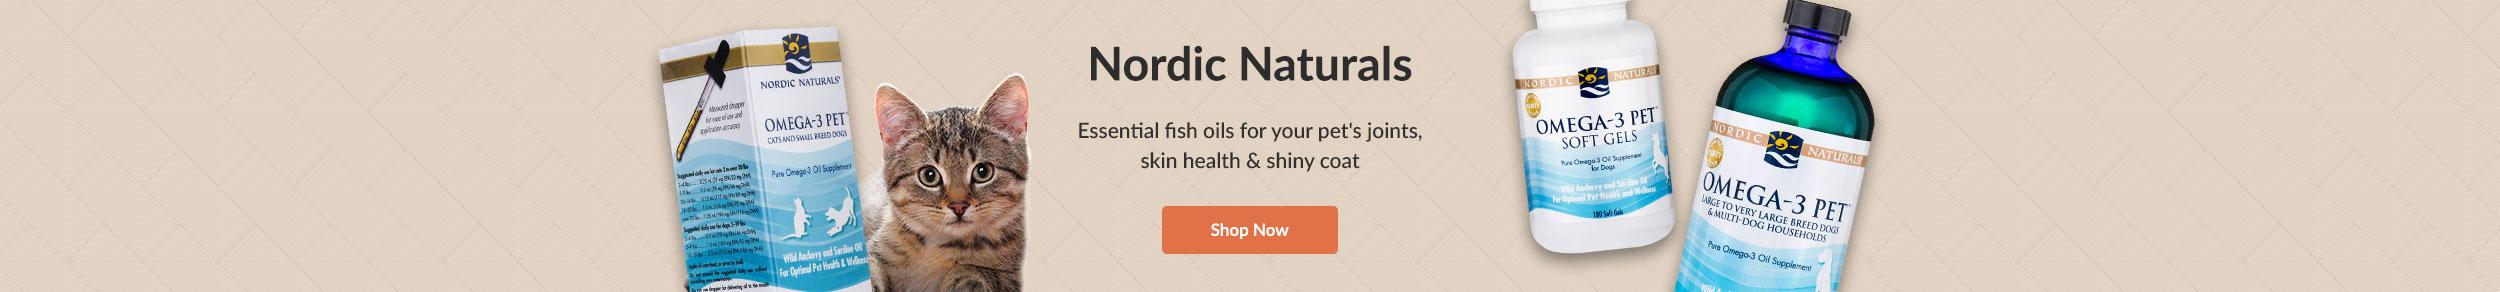 https://i3.pureformulas.net/images/static/Brand_Spotlight_Nordic_Naturals_122818.jpg